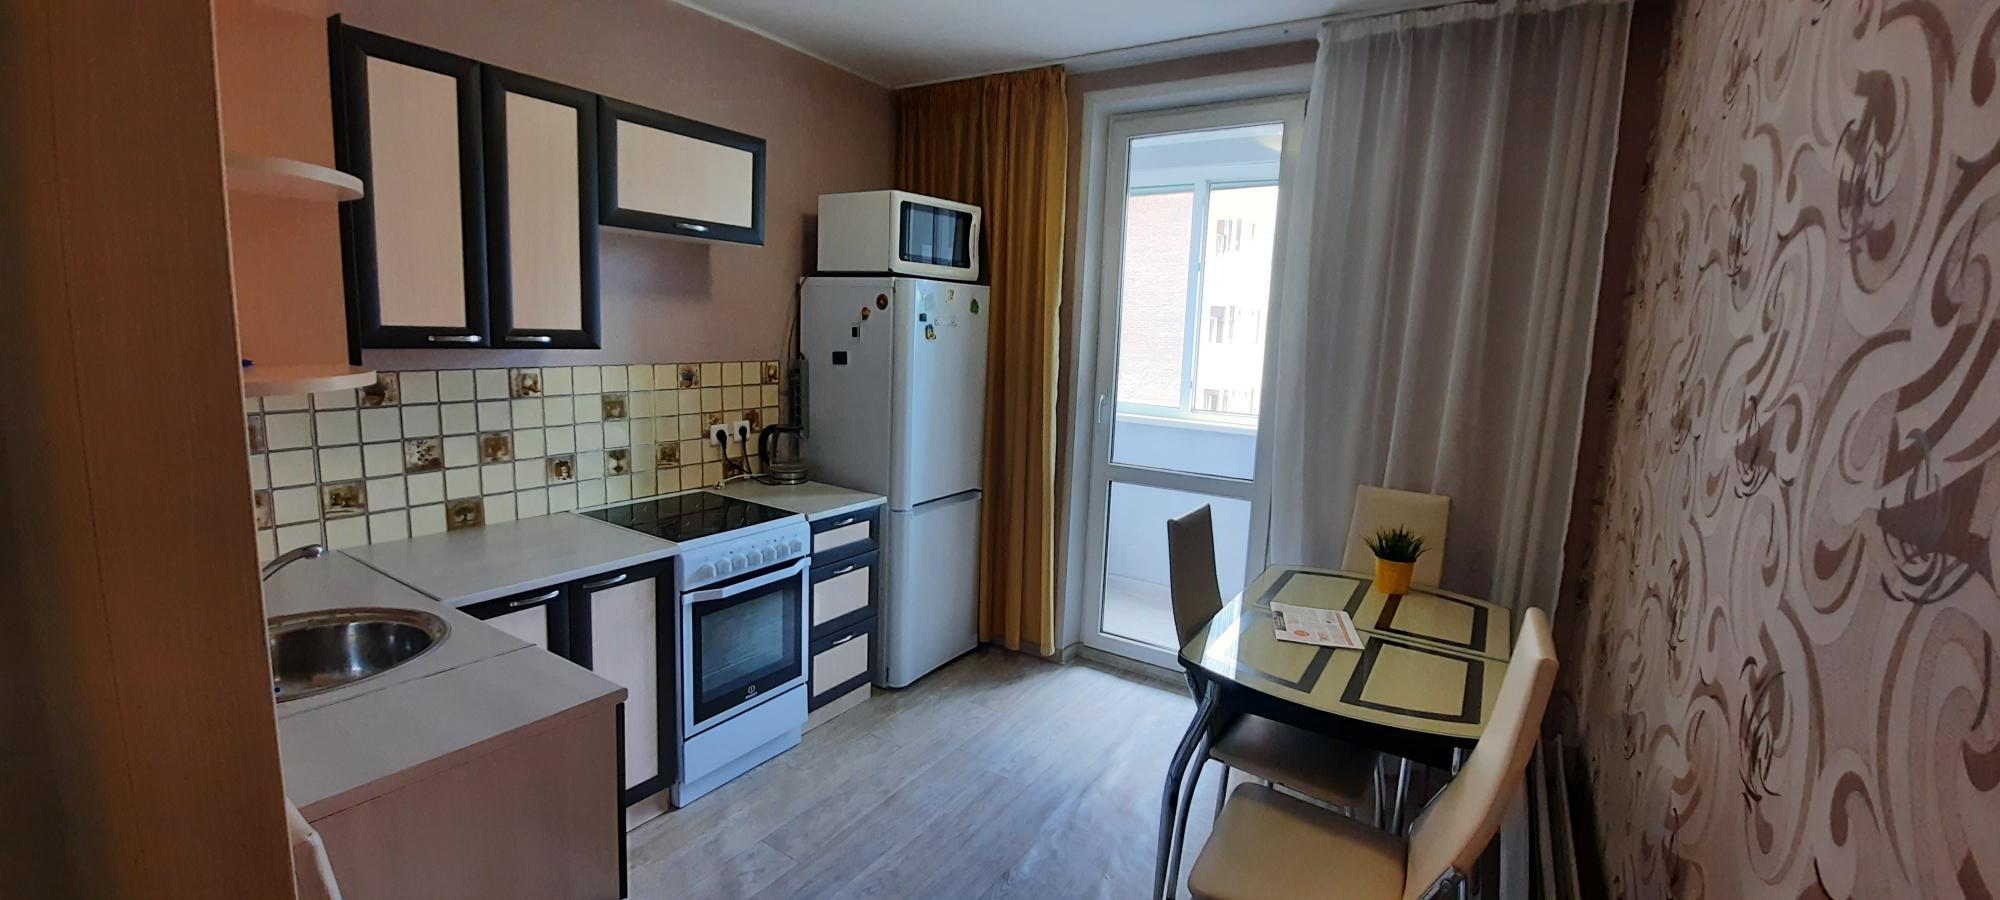 1к квартира Ботанический бульвар, 17 | 17000 | аренда в Красноярске фото 3